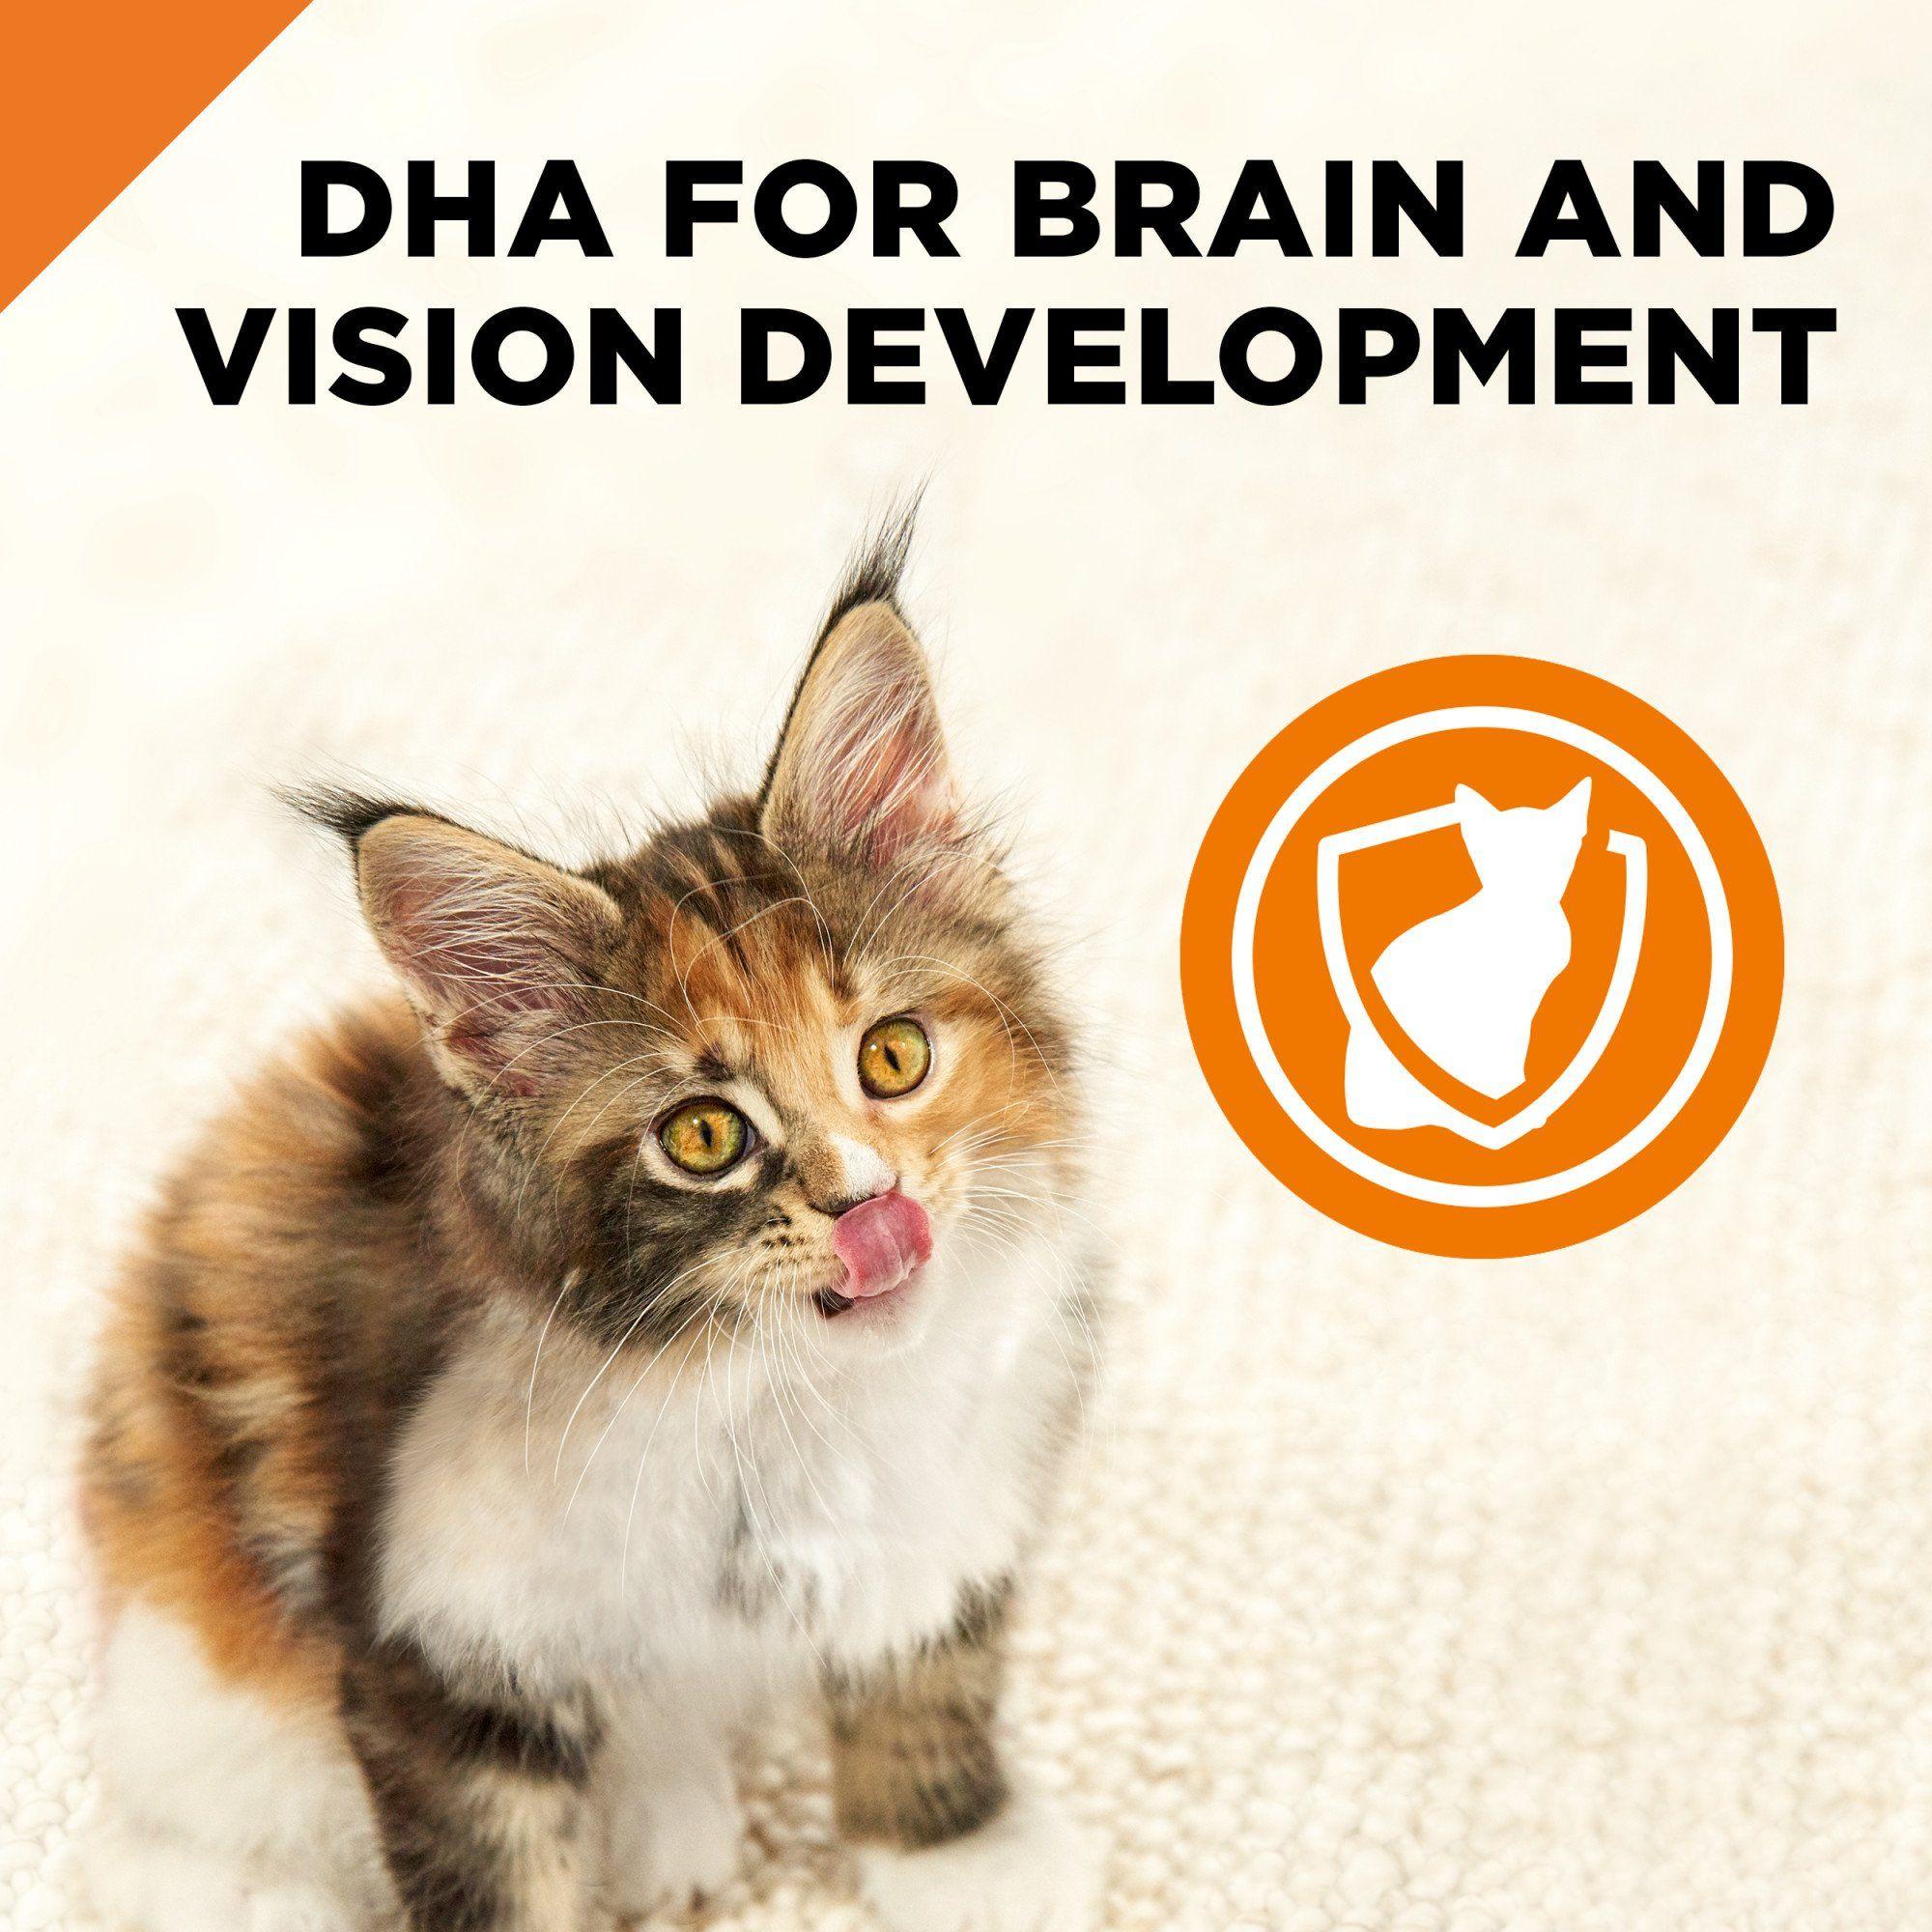 Purina Pro Plan Savor Shredded Blend Chicken Rice Formula Probiotics Dry Kitten Food 3 Lbs Kitten Food Wild Bird Food Kittens